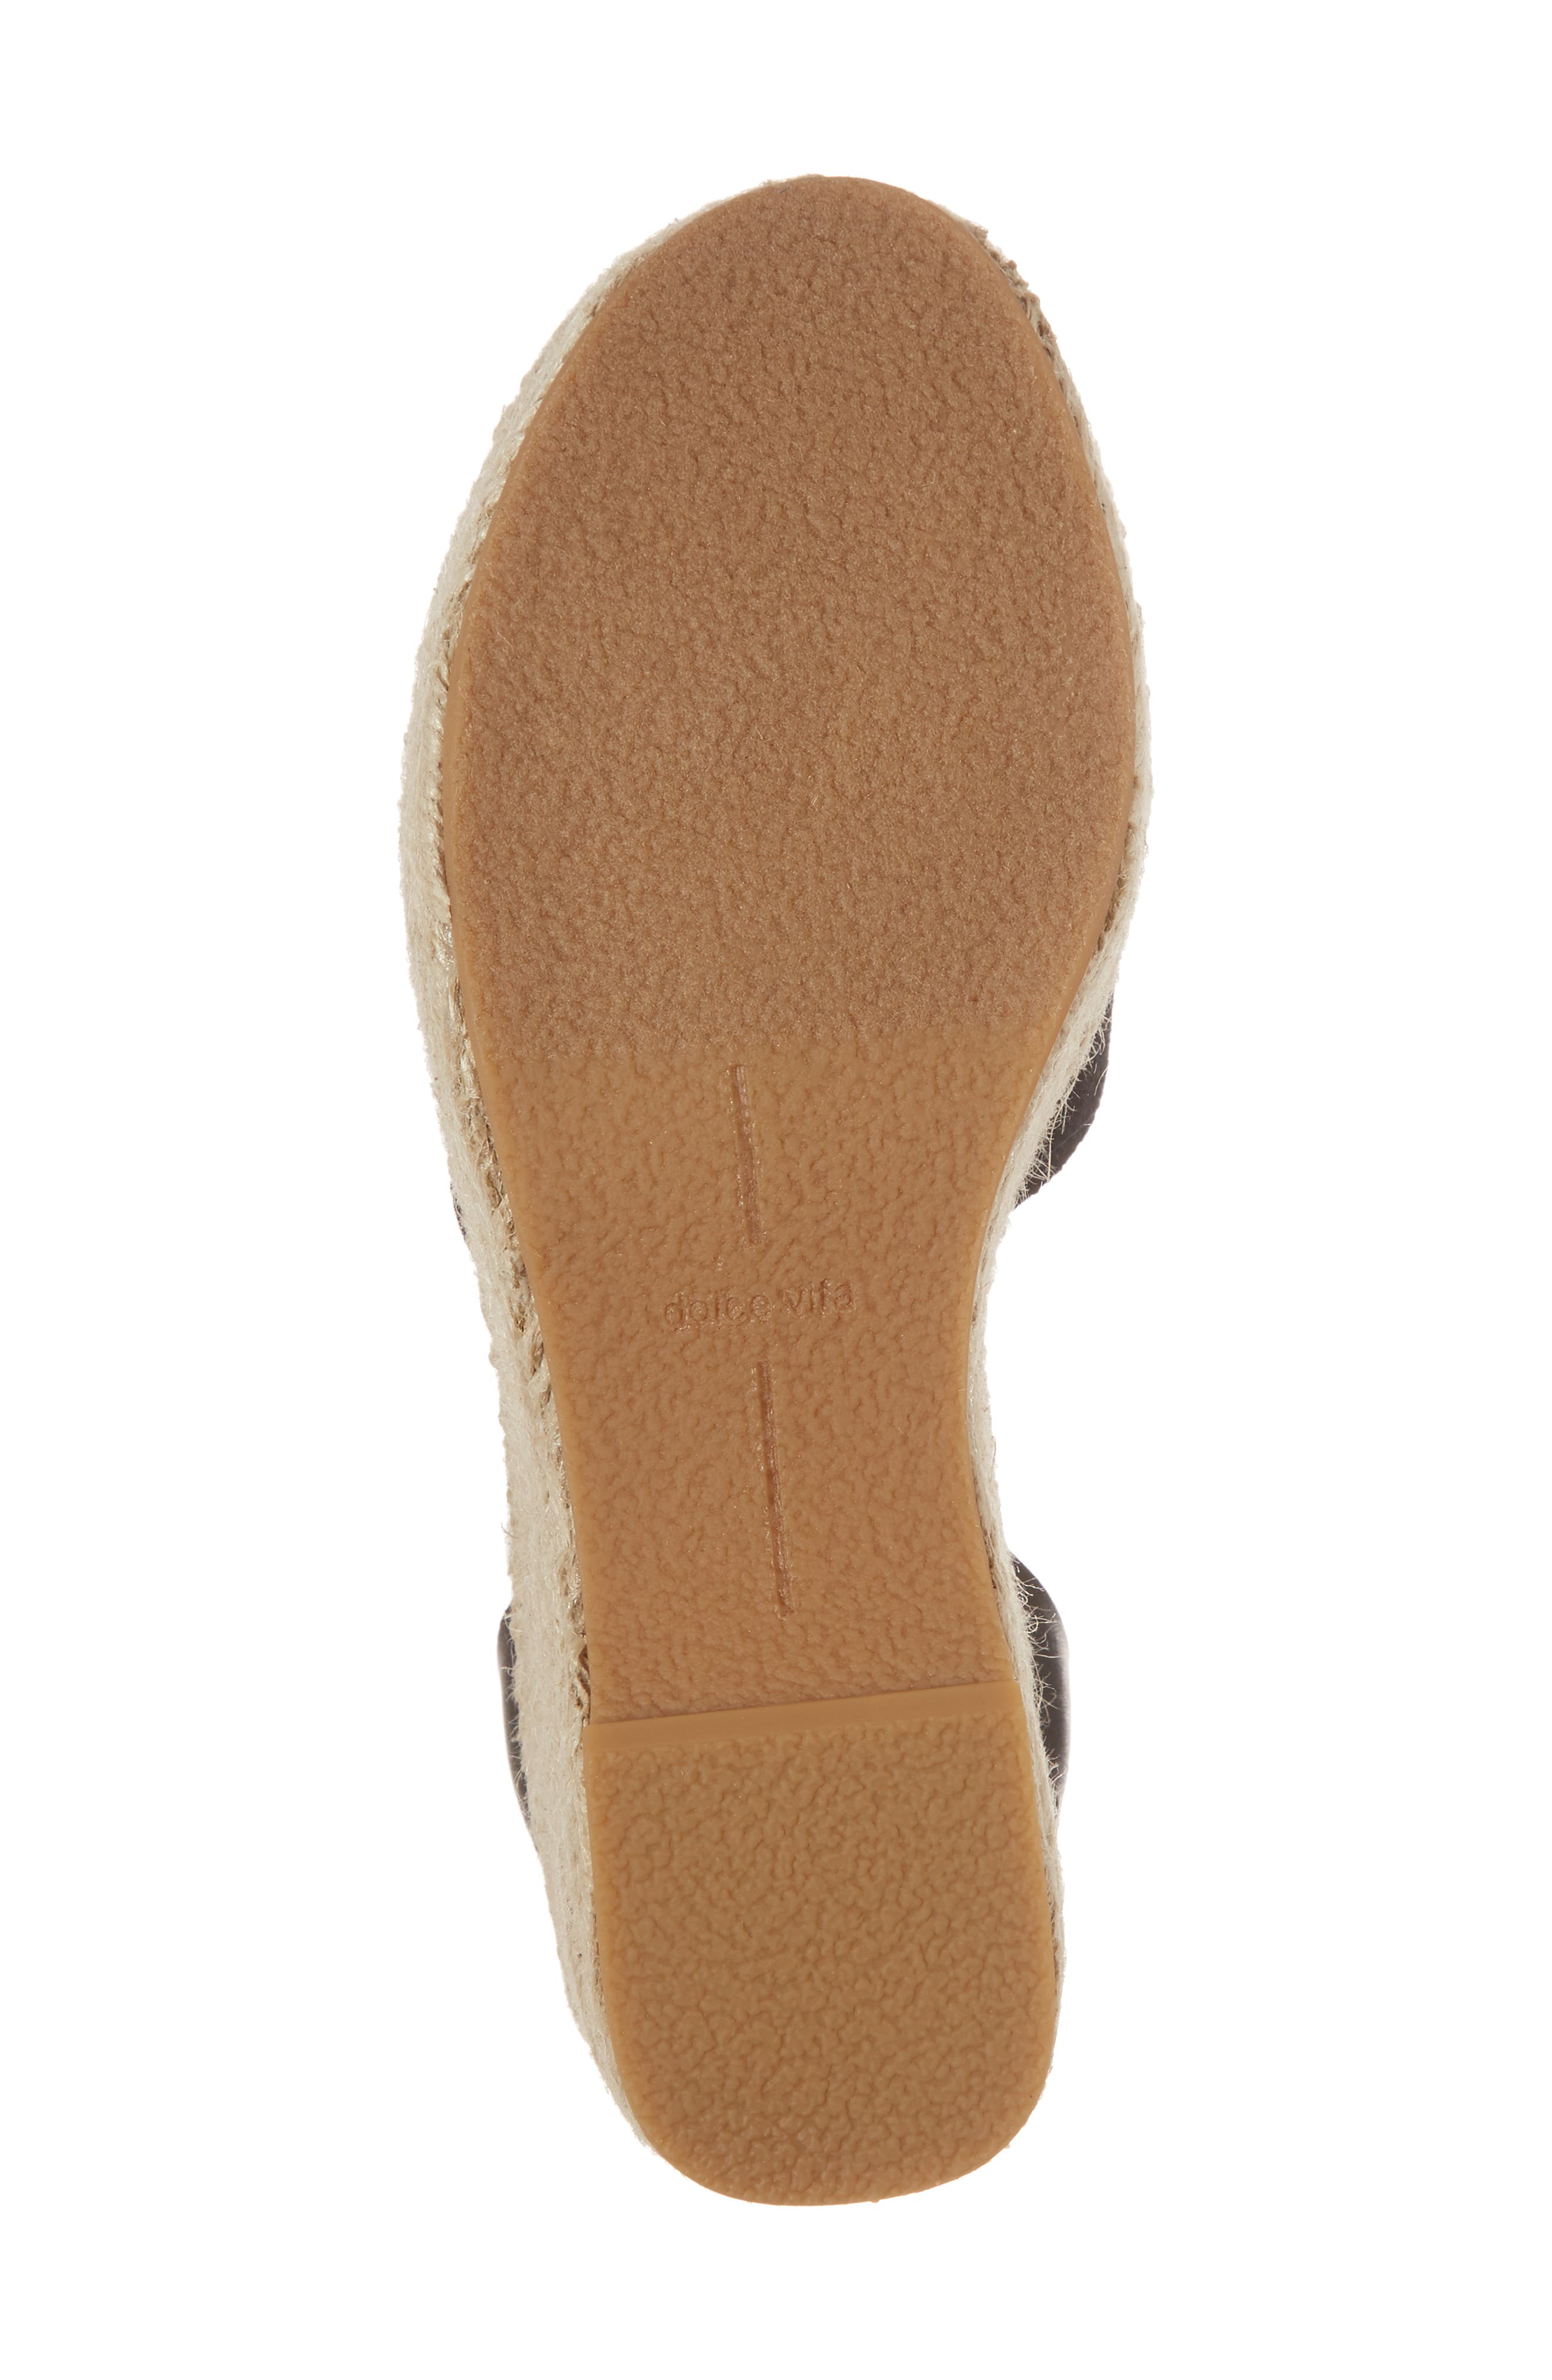 Lesly Espadrille Platform Sandal,                             Alternate thumbnail 6, color,                             001